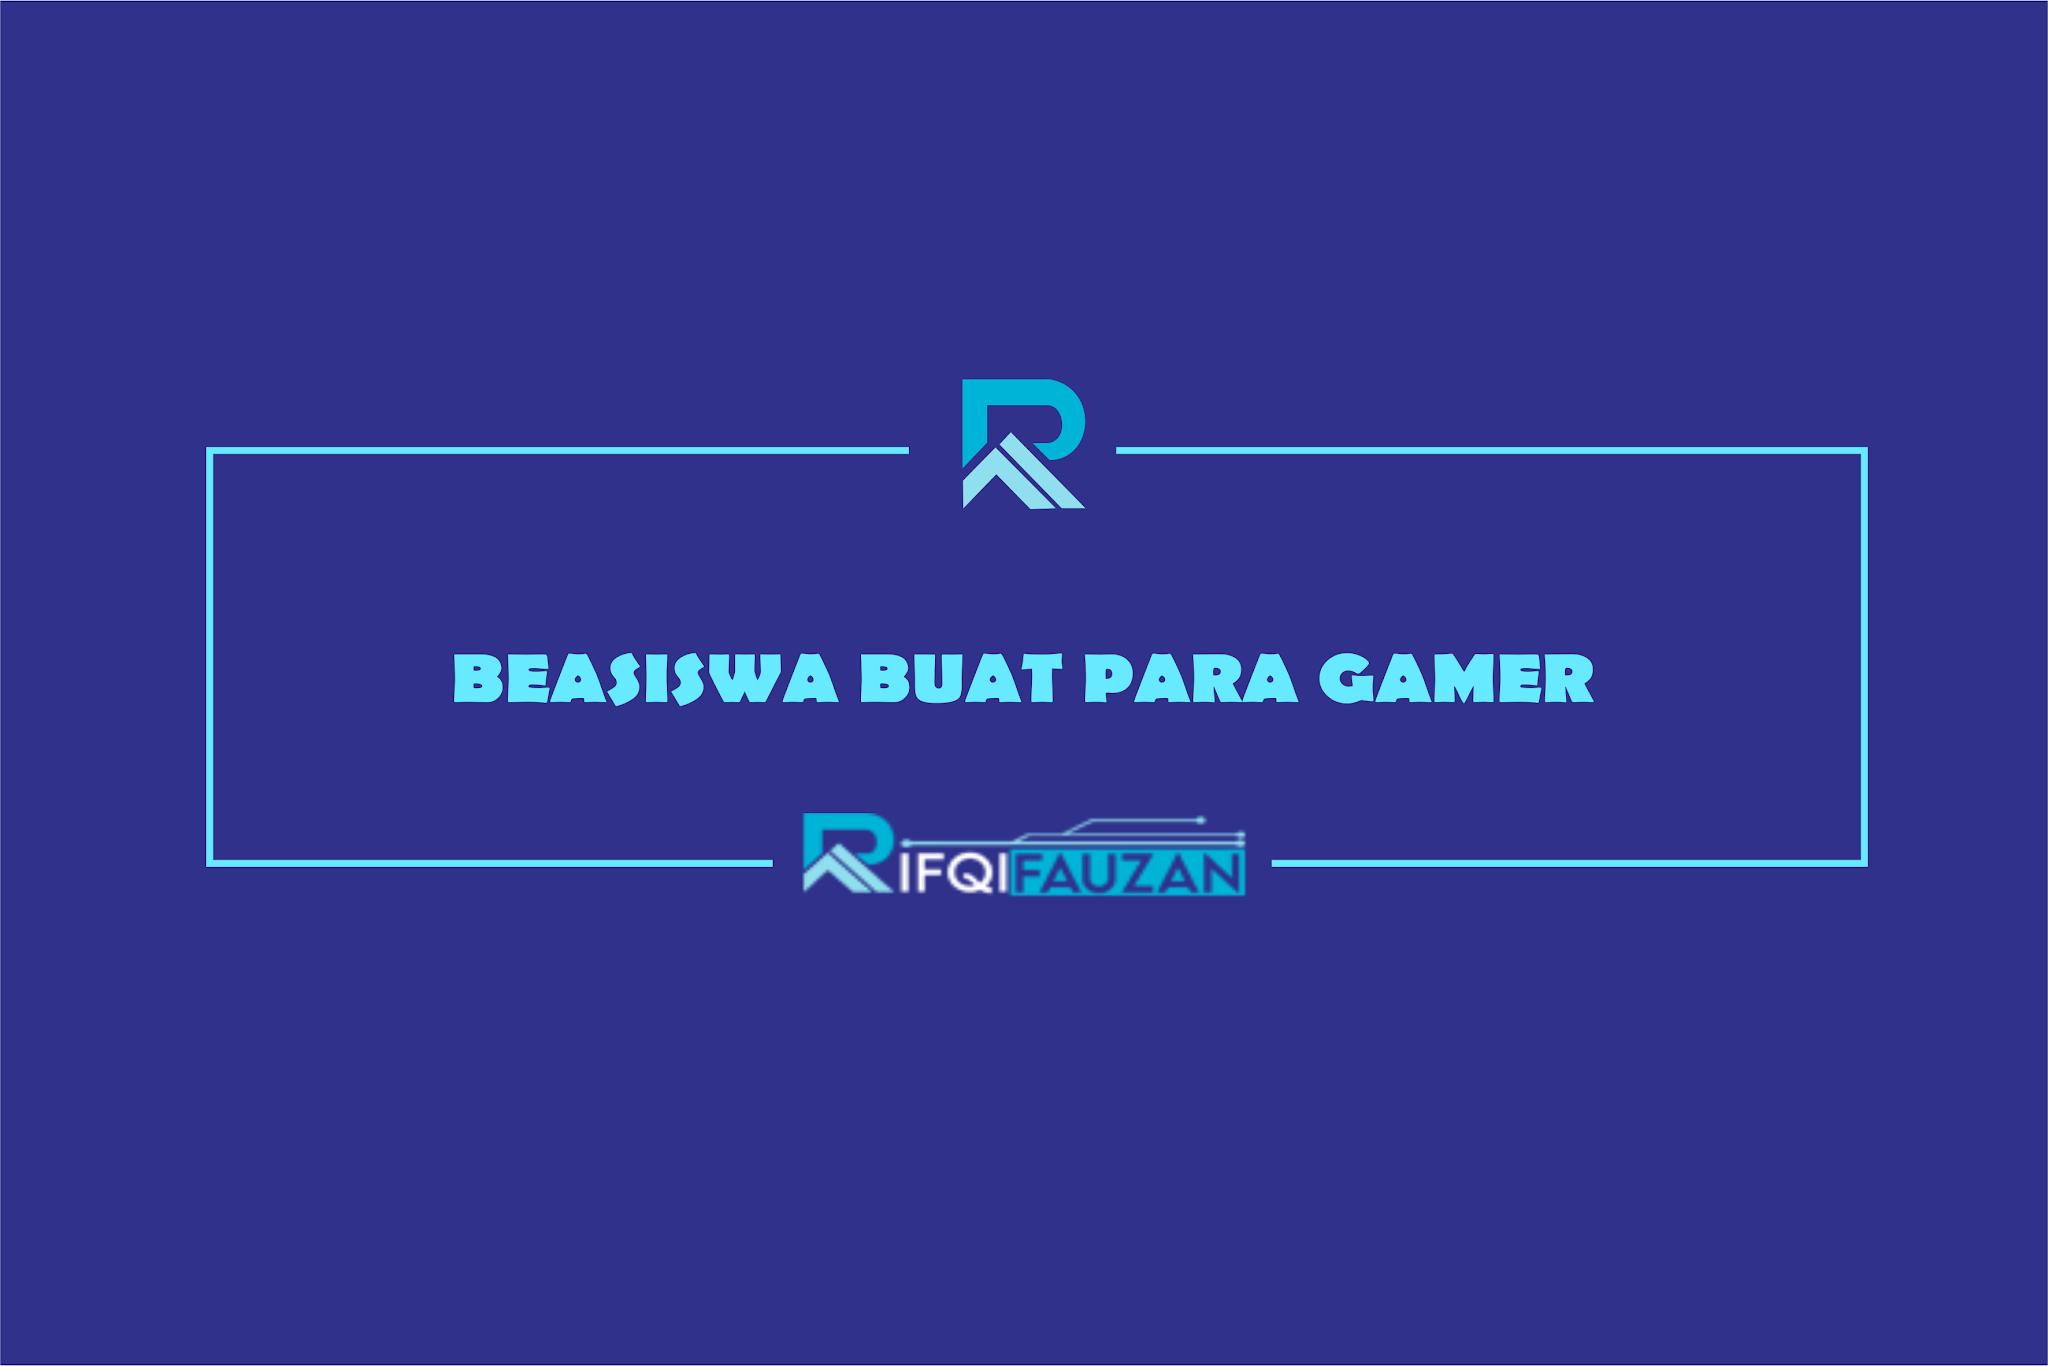 BEASISWA KULIAH FULL 2020 BUAT PARA GAMER !!!